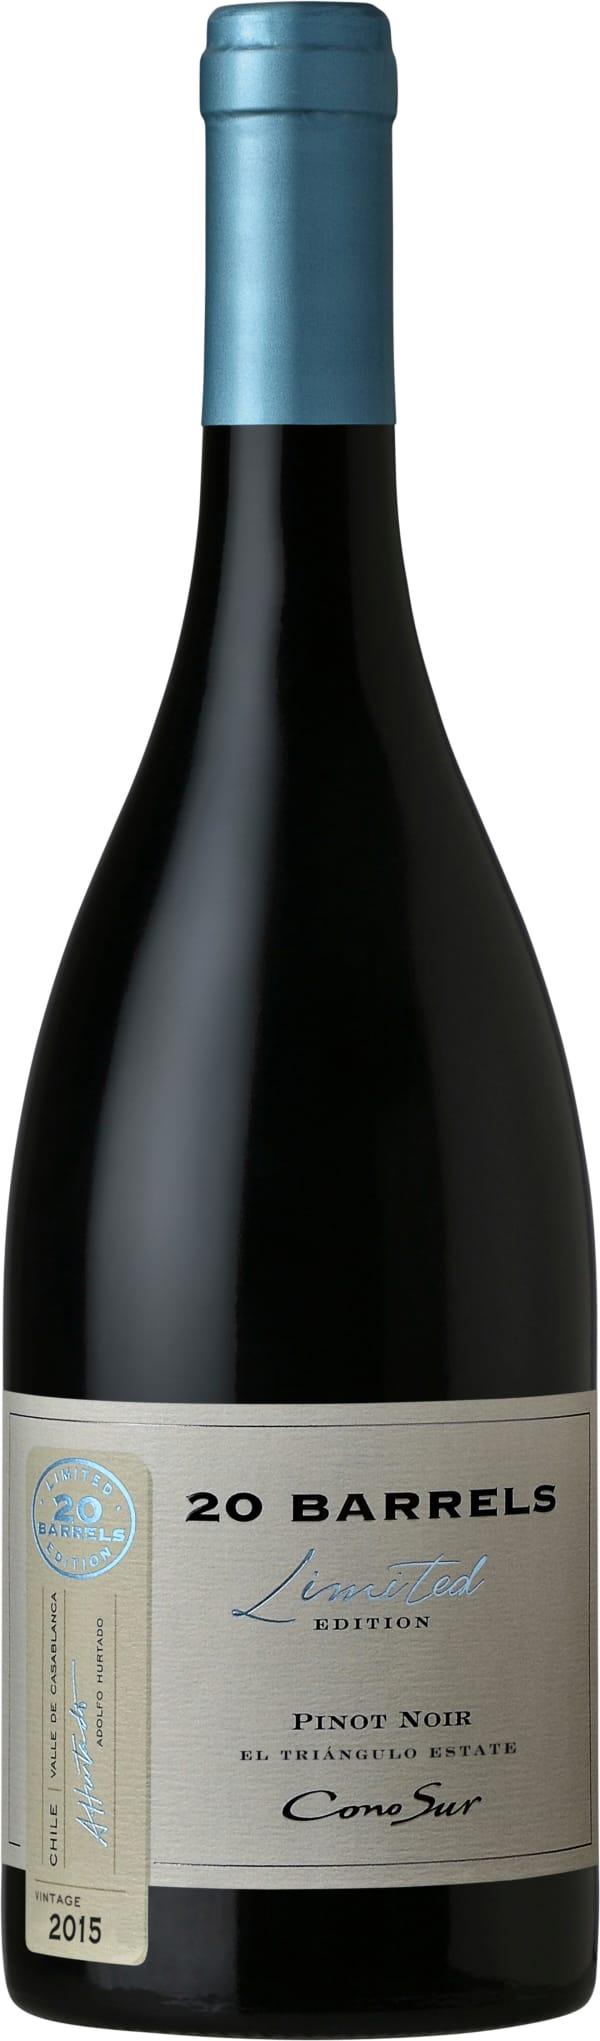 Cono Sur 20 Barrels Pinot Noir 2016